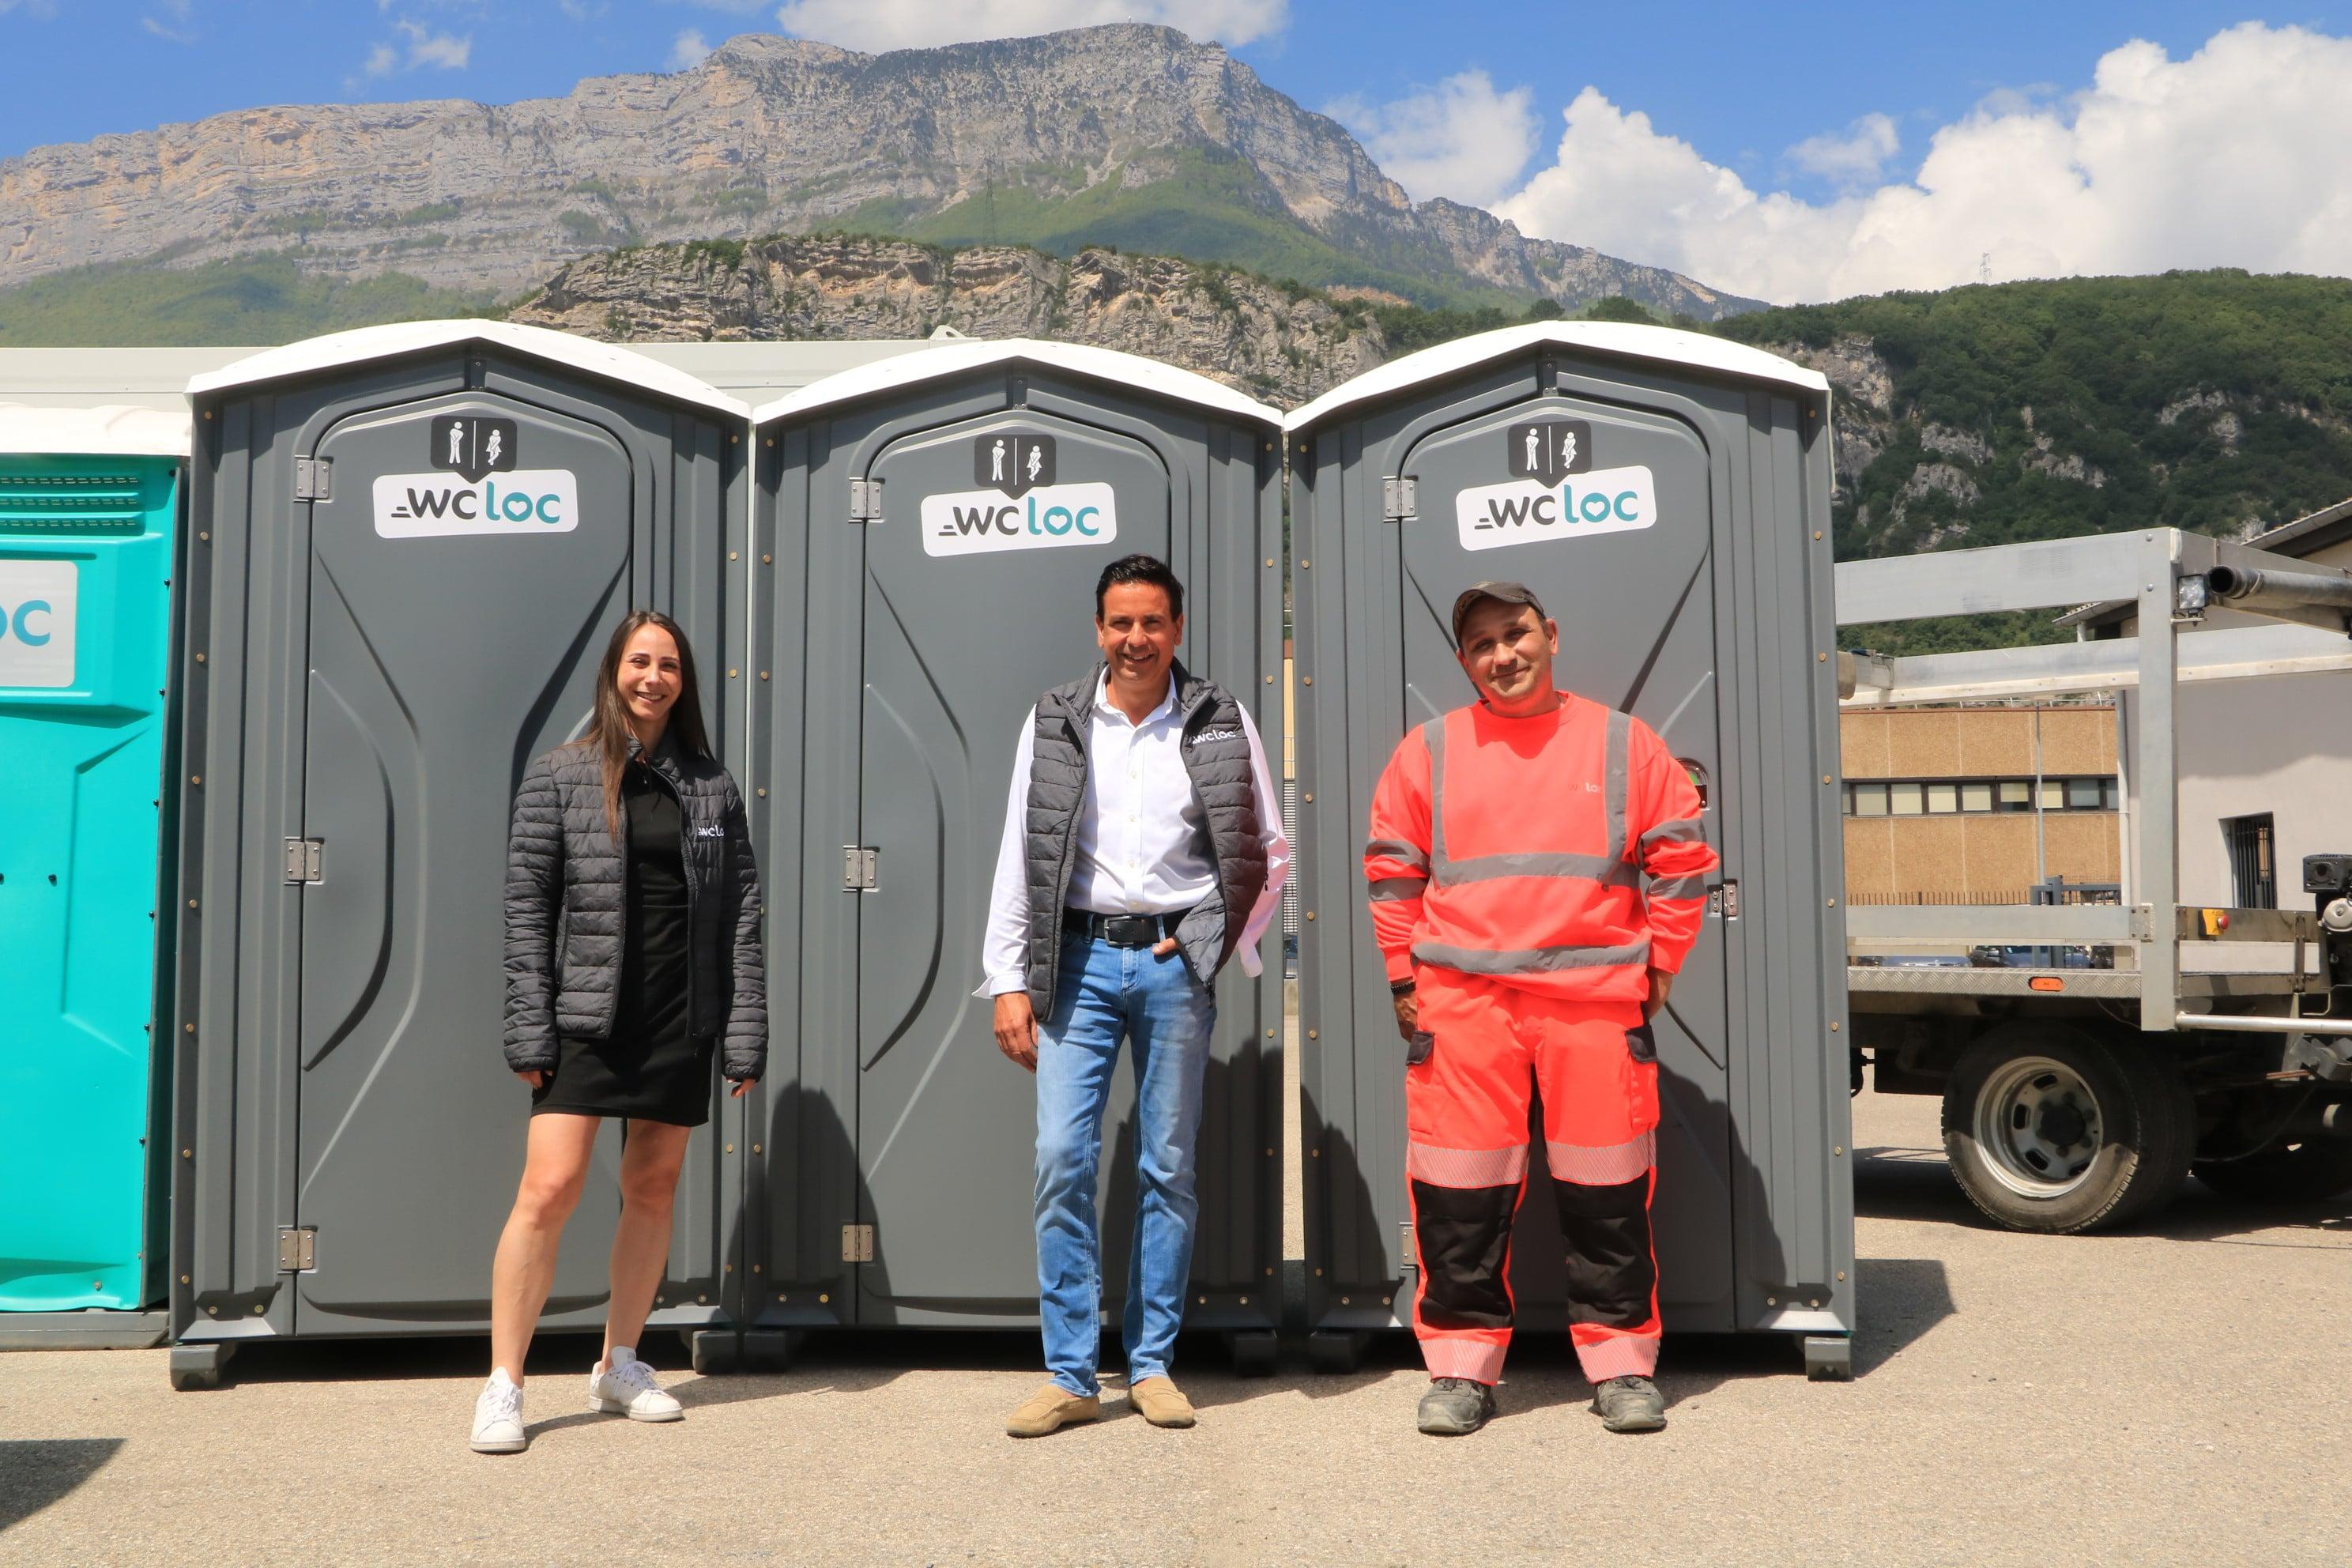 WC Loc Grenoble